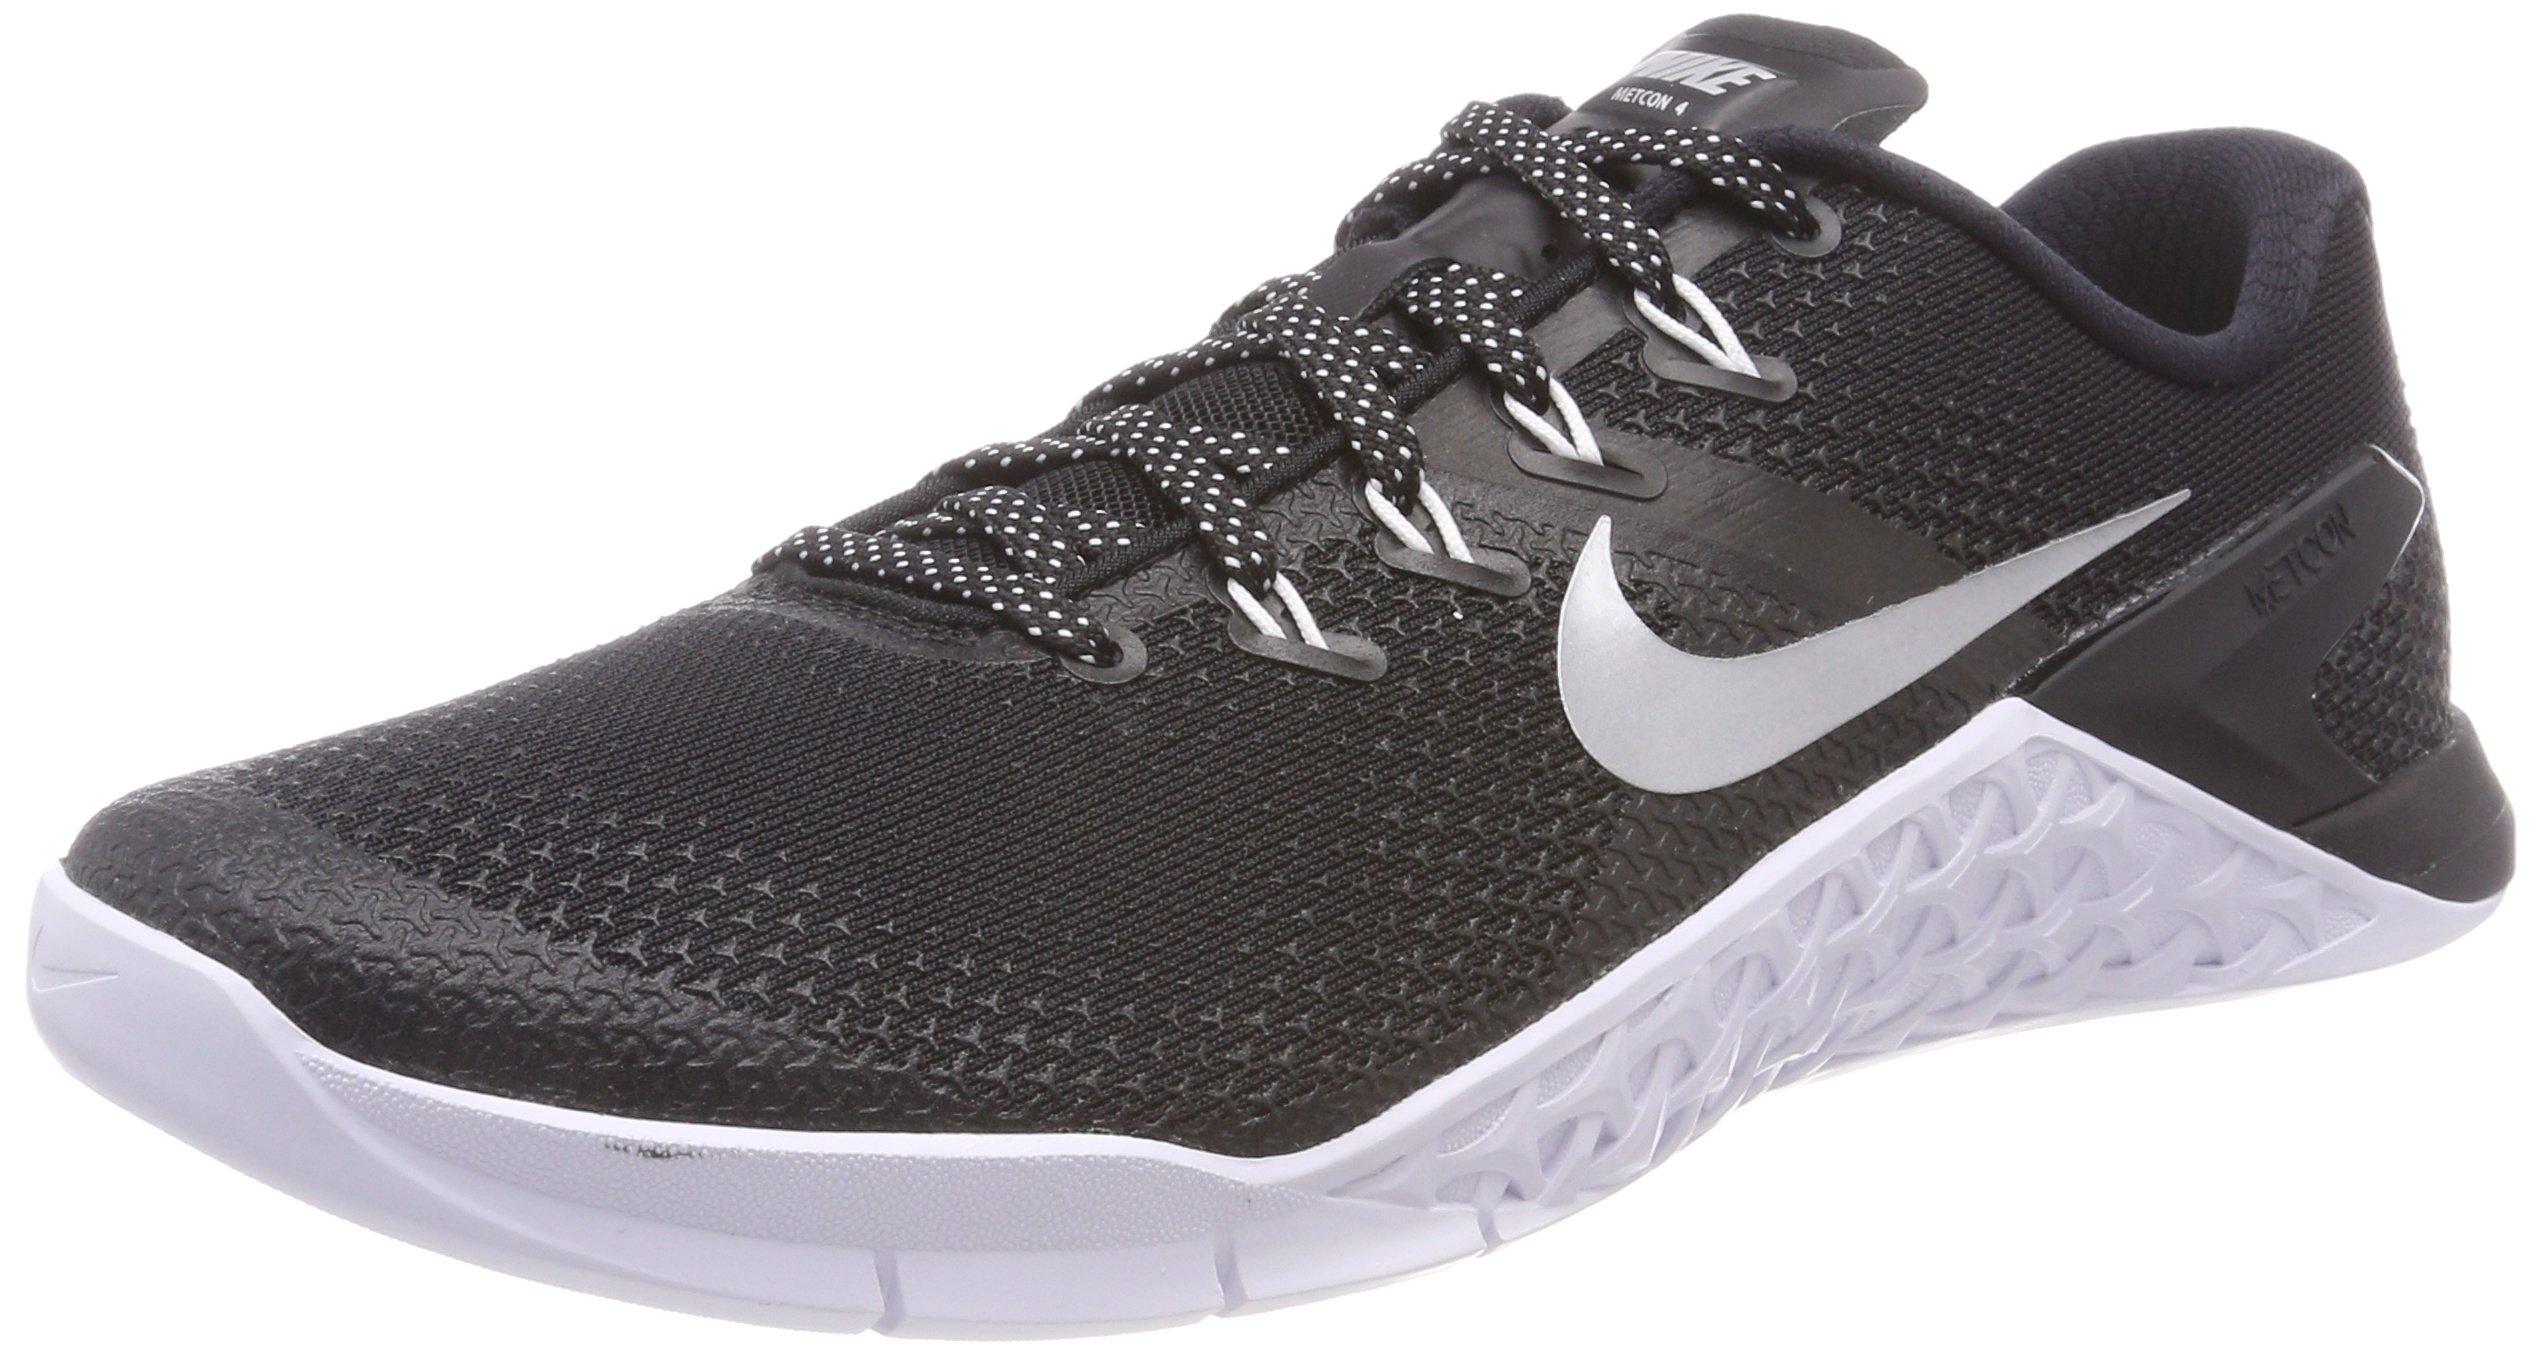 Nike Women's Metcon 4 Training Shoe Black/Metallic Silver-White-Volt Glow 6.0